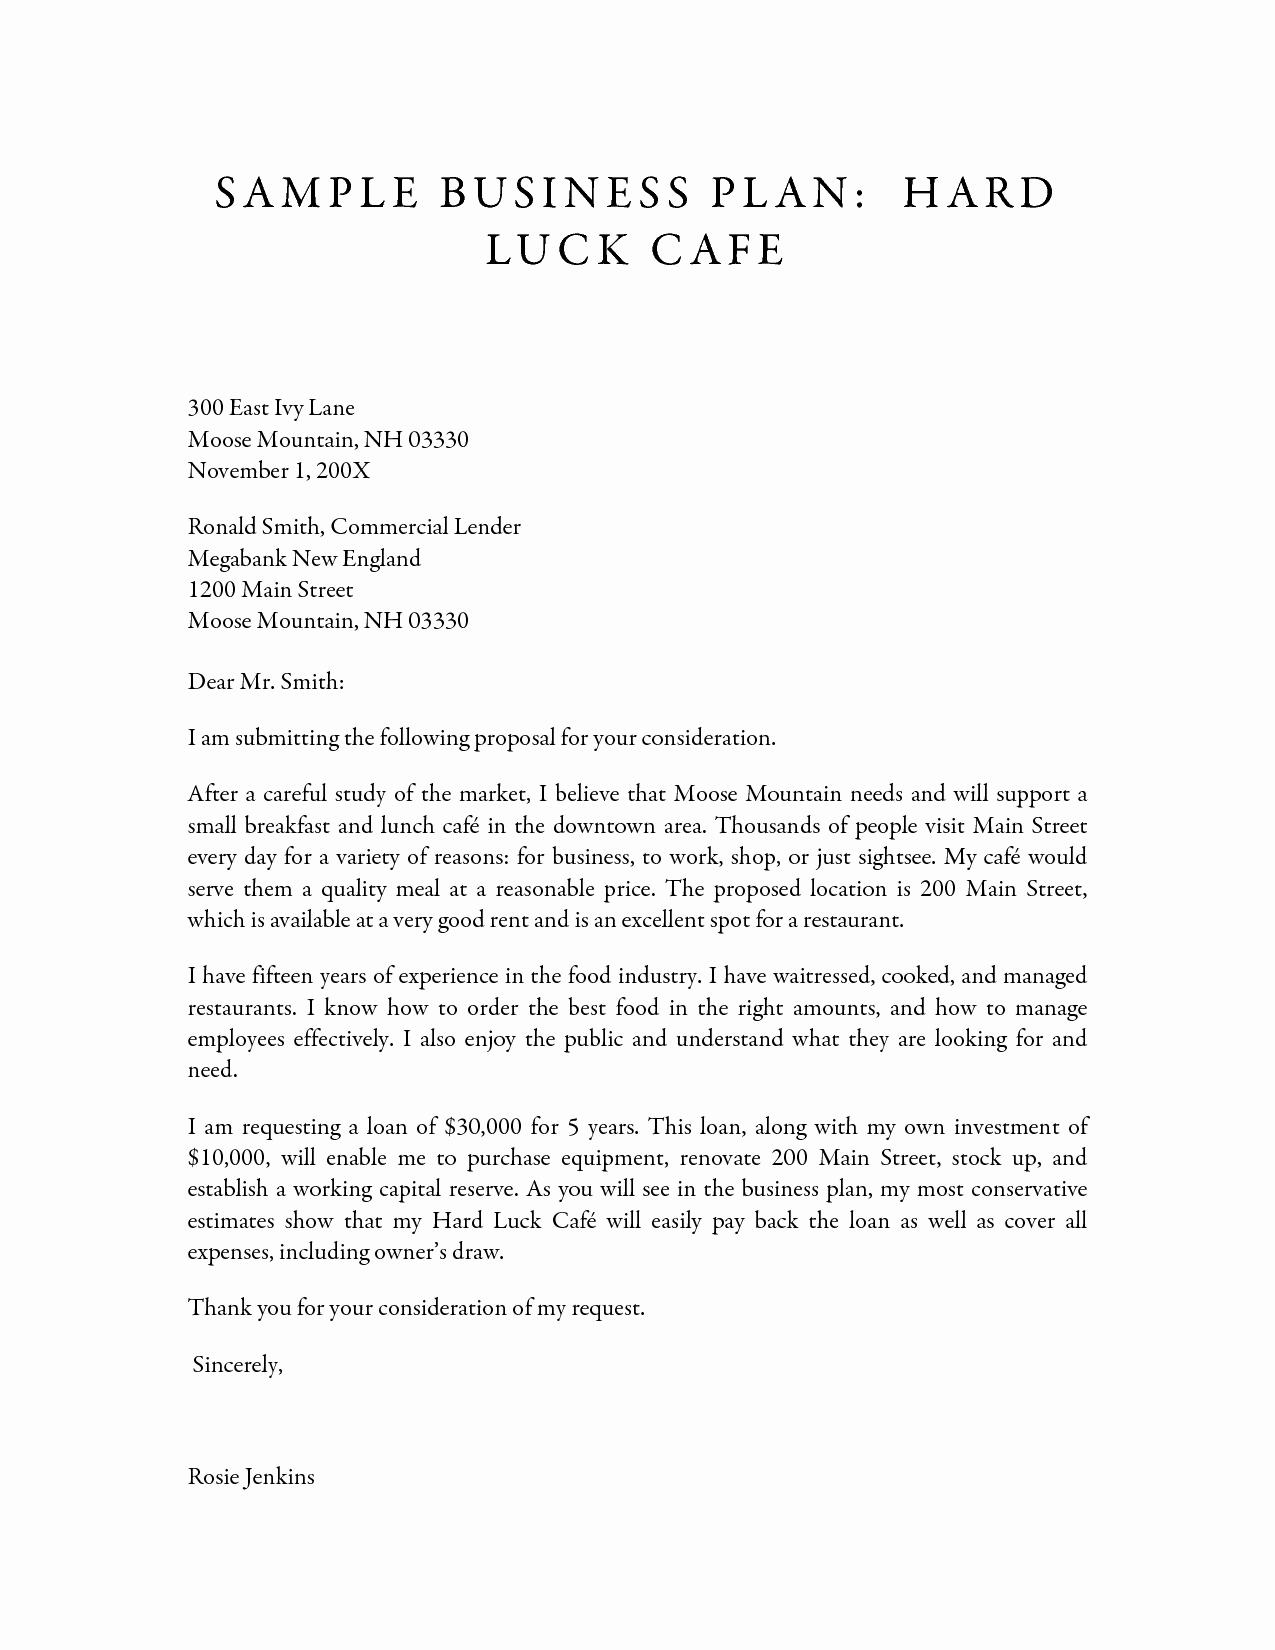 Business Proposals Samples Mughals